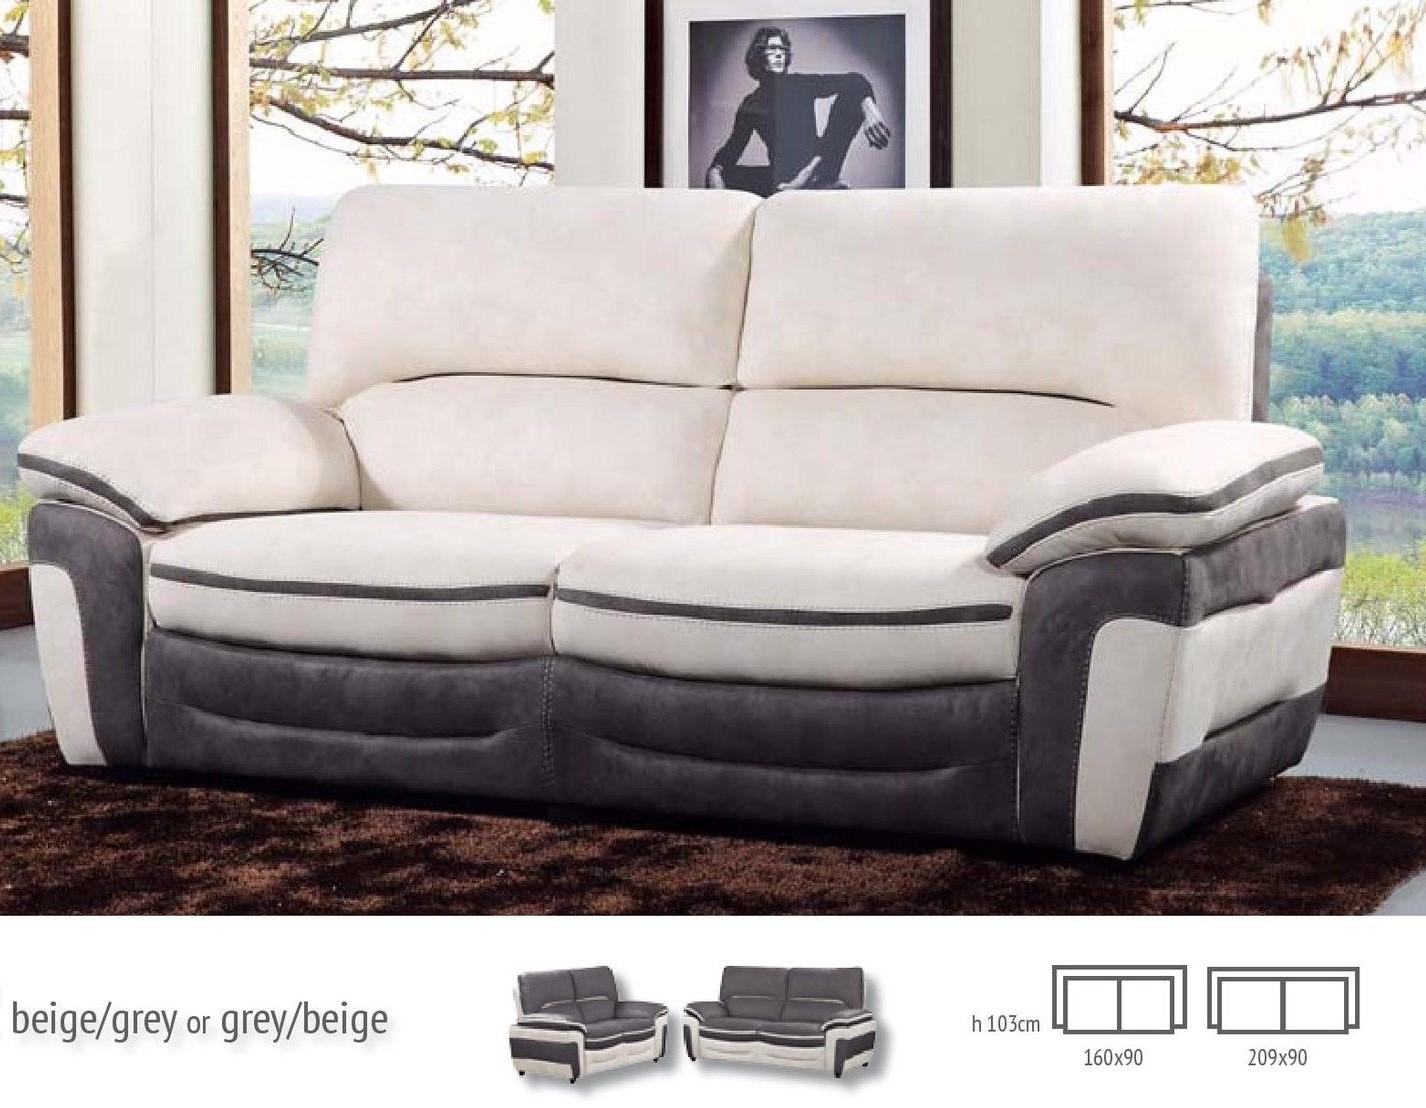 sofas birmingham corner sofa and armchair set 3 43 2 leather suite rjf furnishings